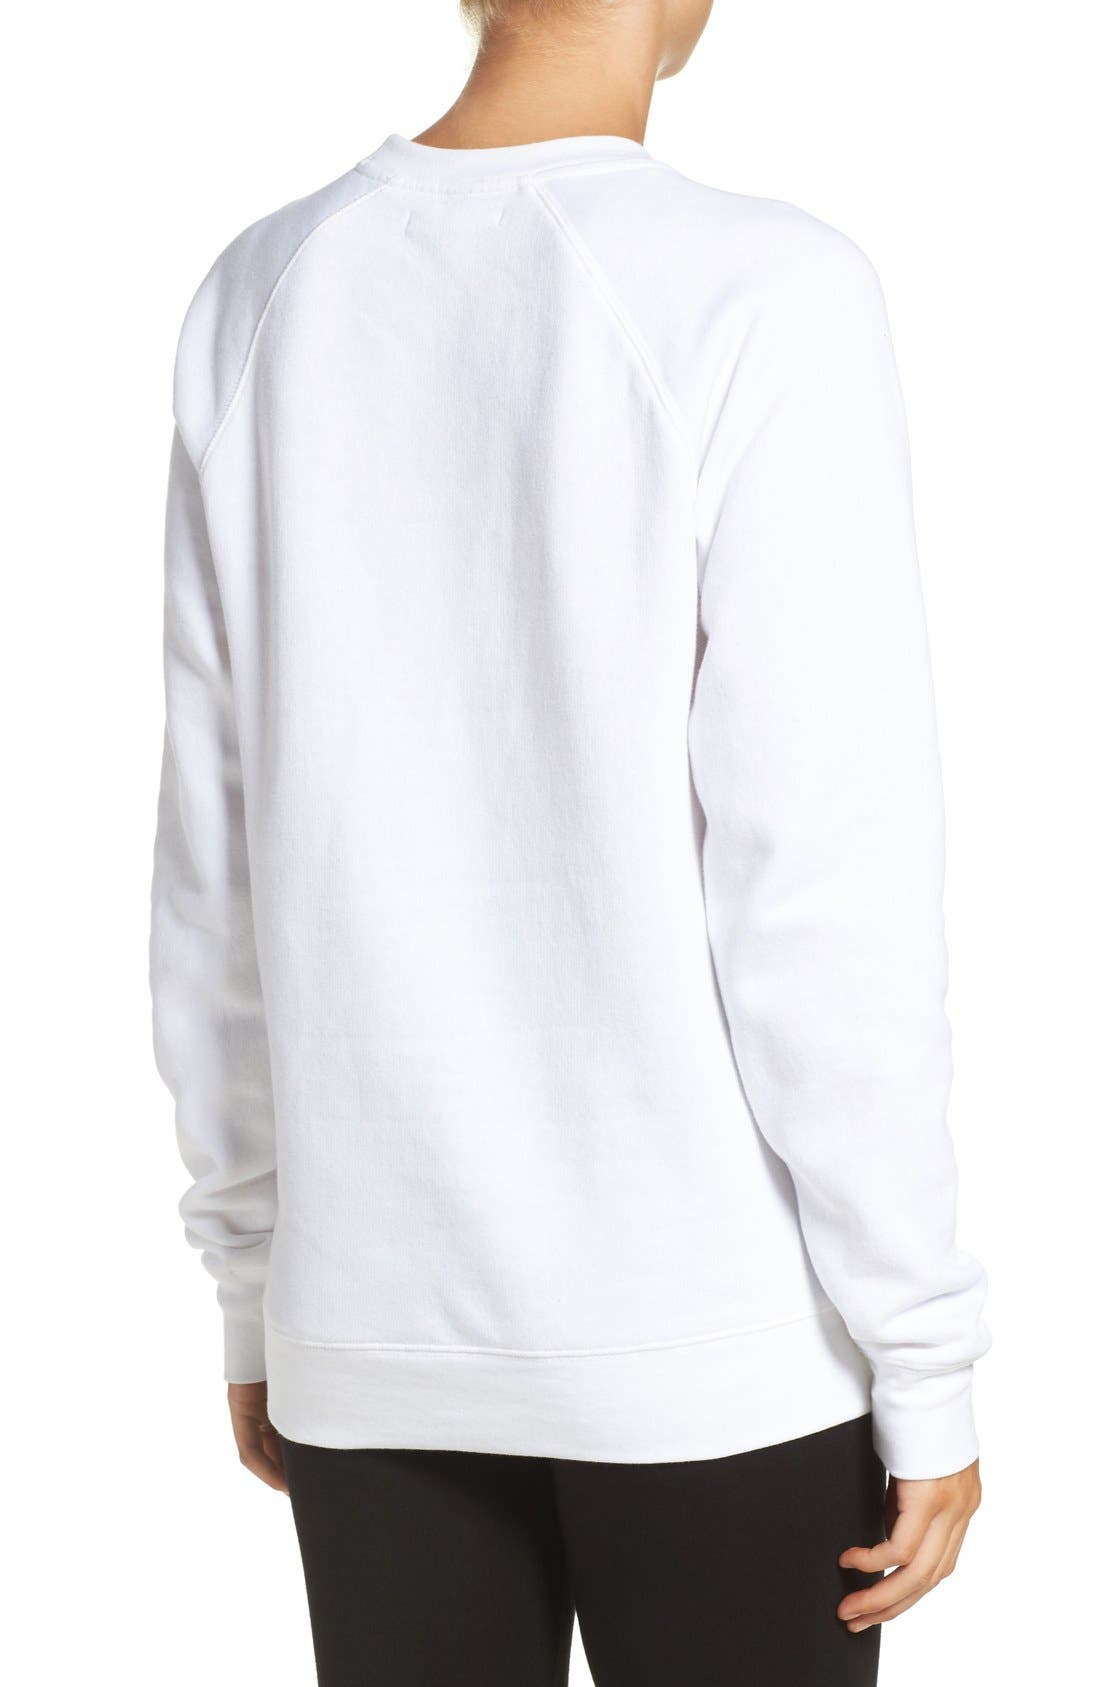 Alternate Image 2  - Brunette 'Roll Call' Crewneck Sweatshirt